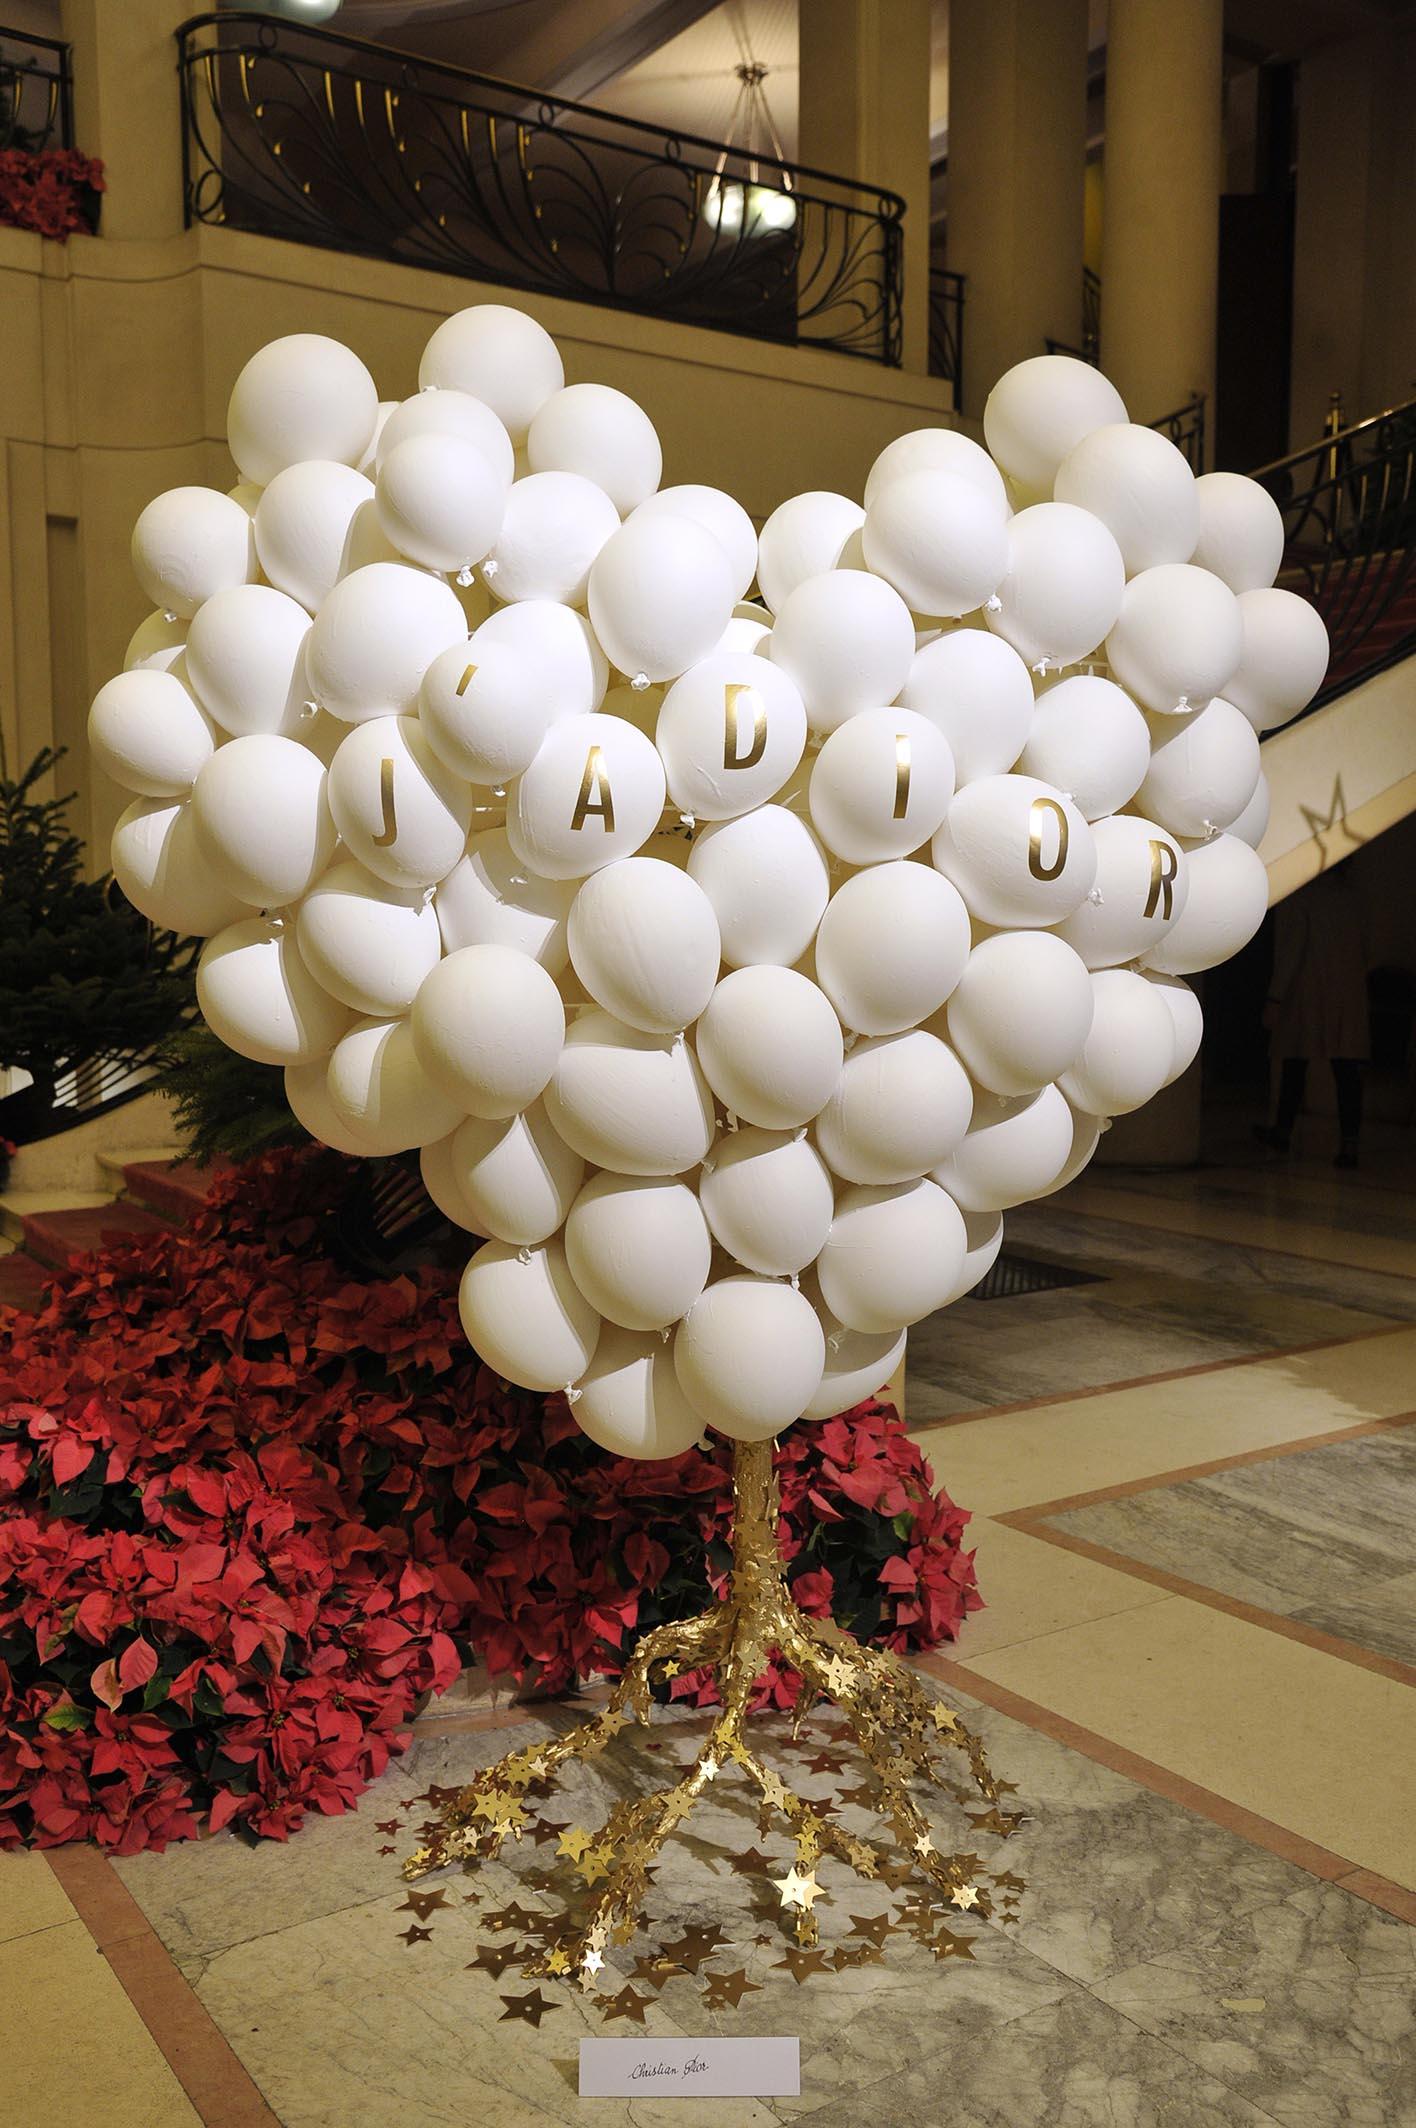 The Dior tree